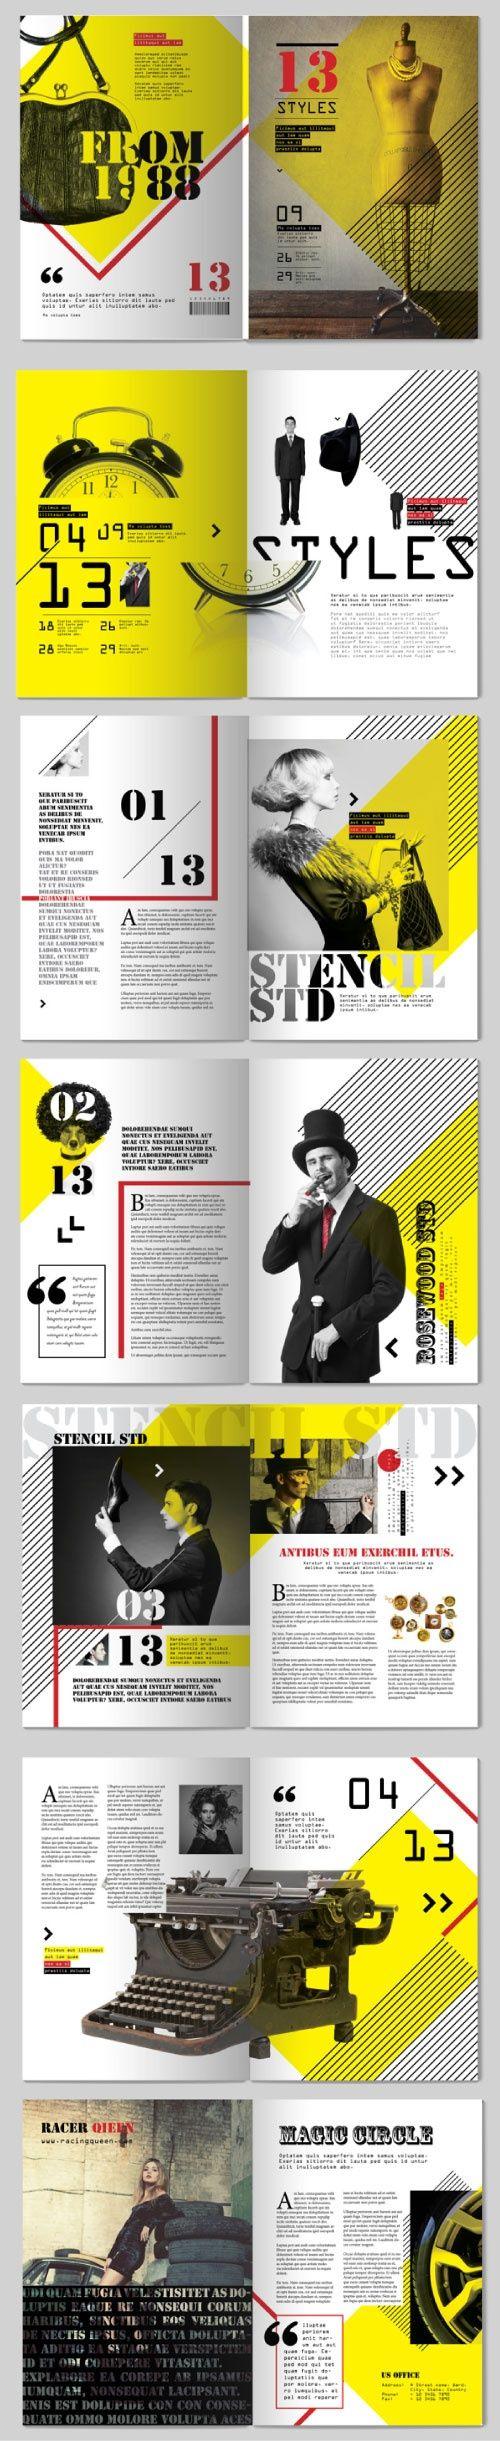 13 Styles Magazine Design || Tony Huynh #publication